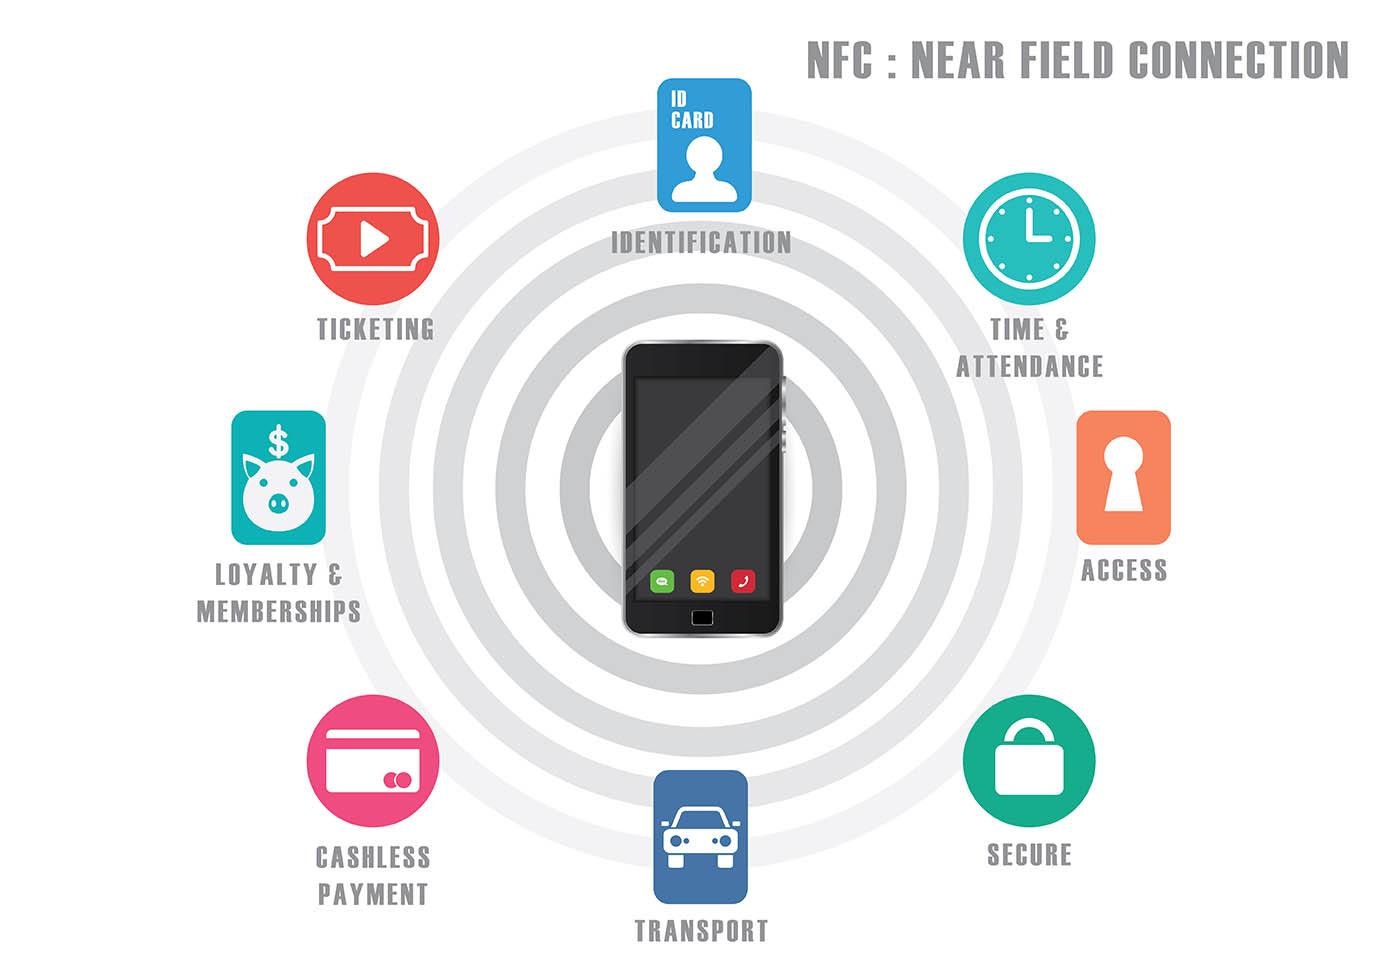 Bright NFC Icon Vector - Download Free Vector Art, Stock ...  Bright NFC Icon...